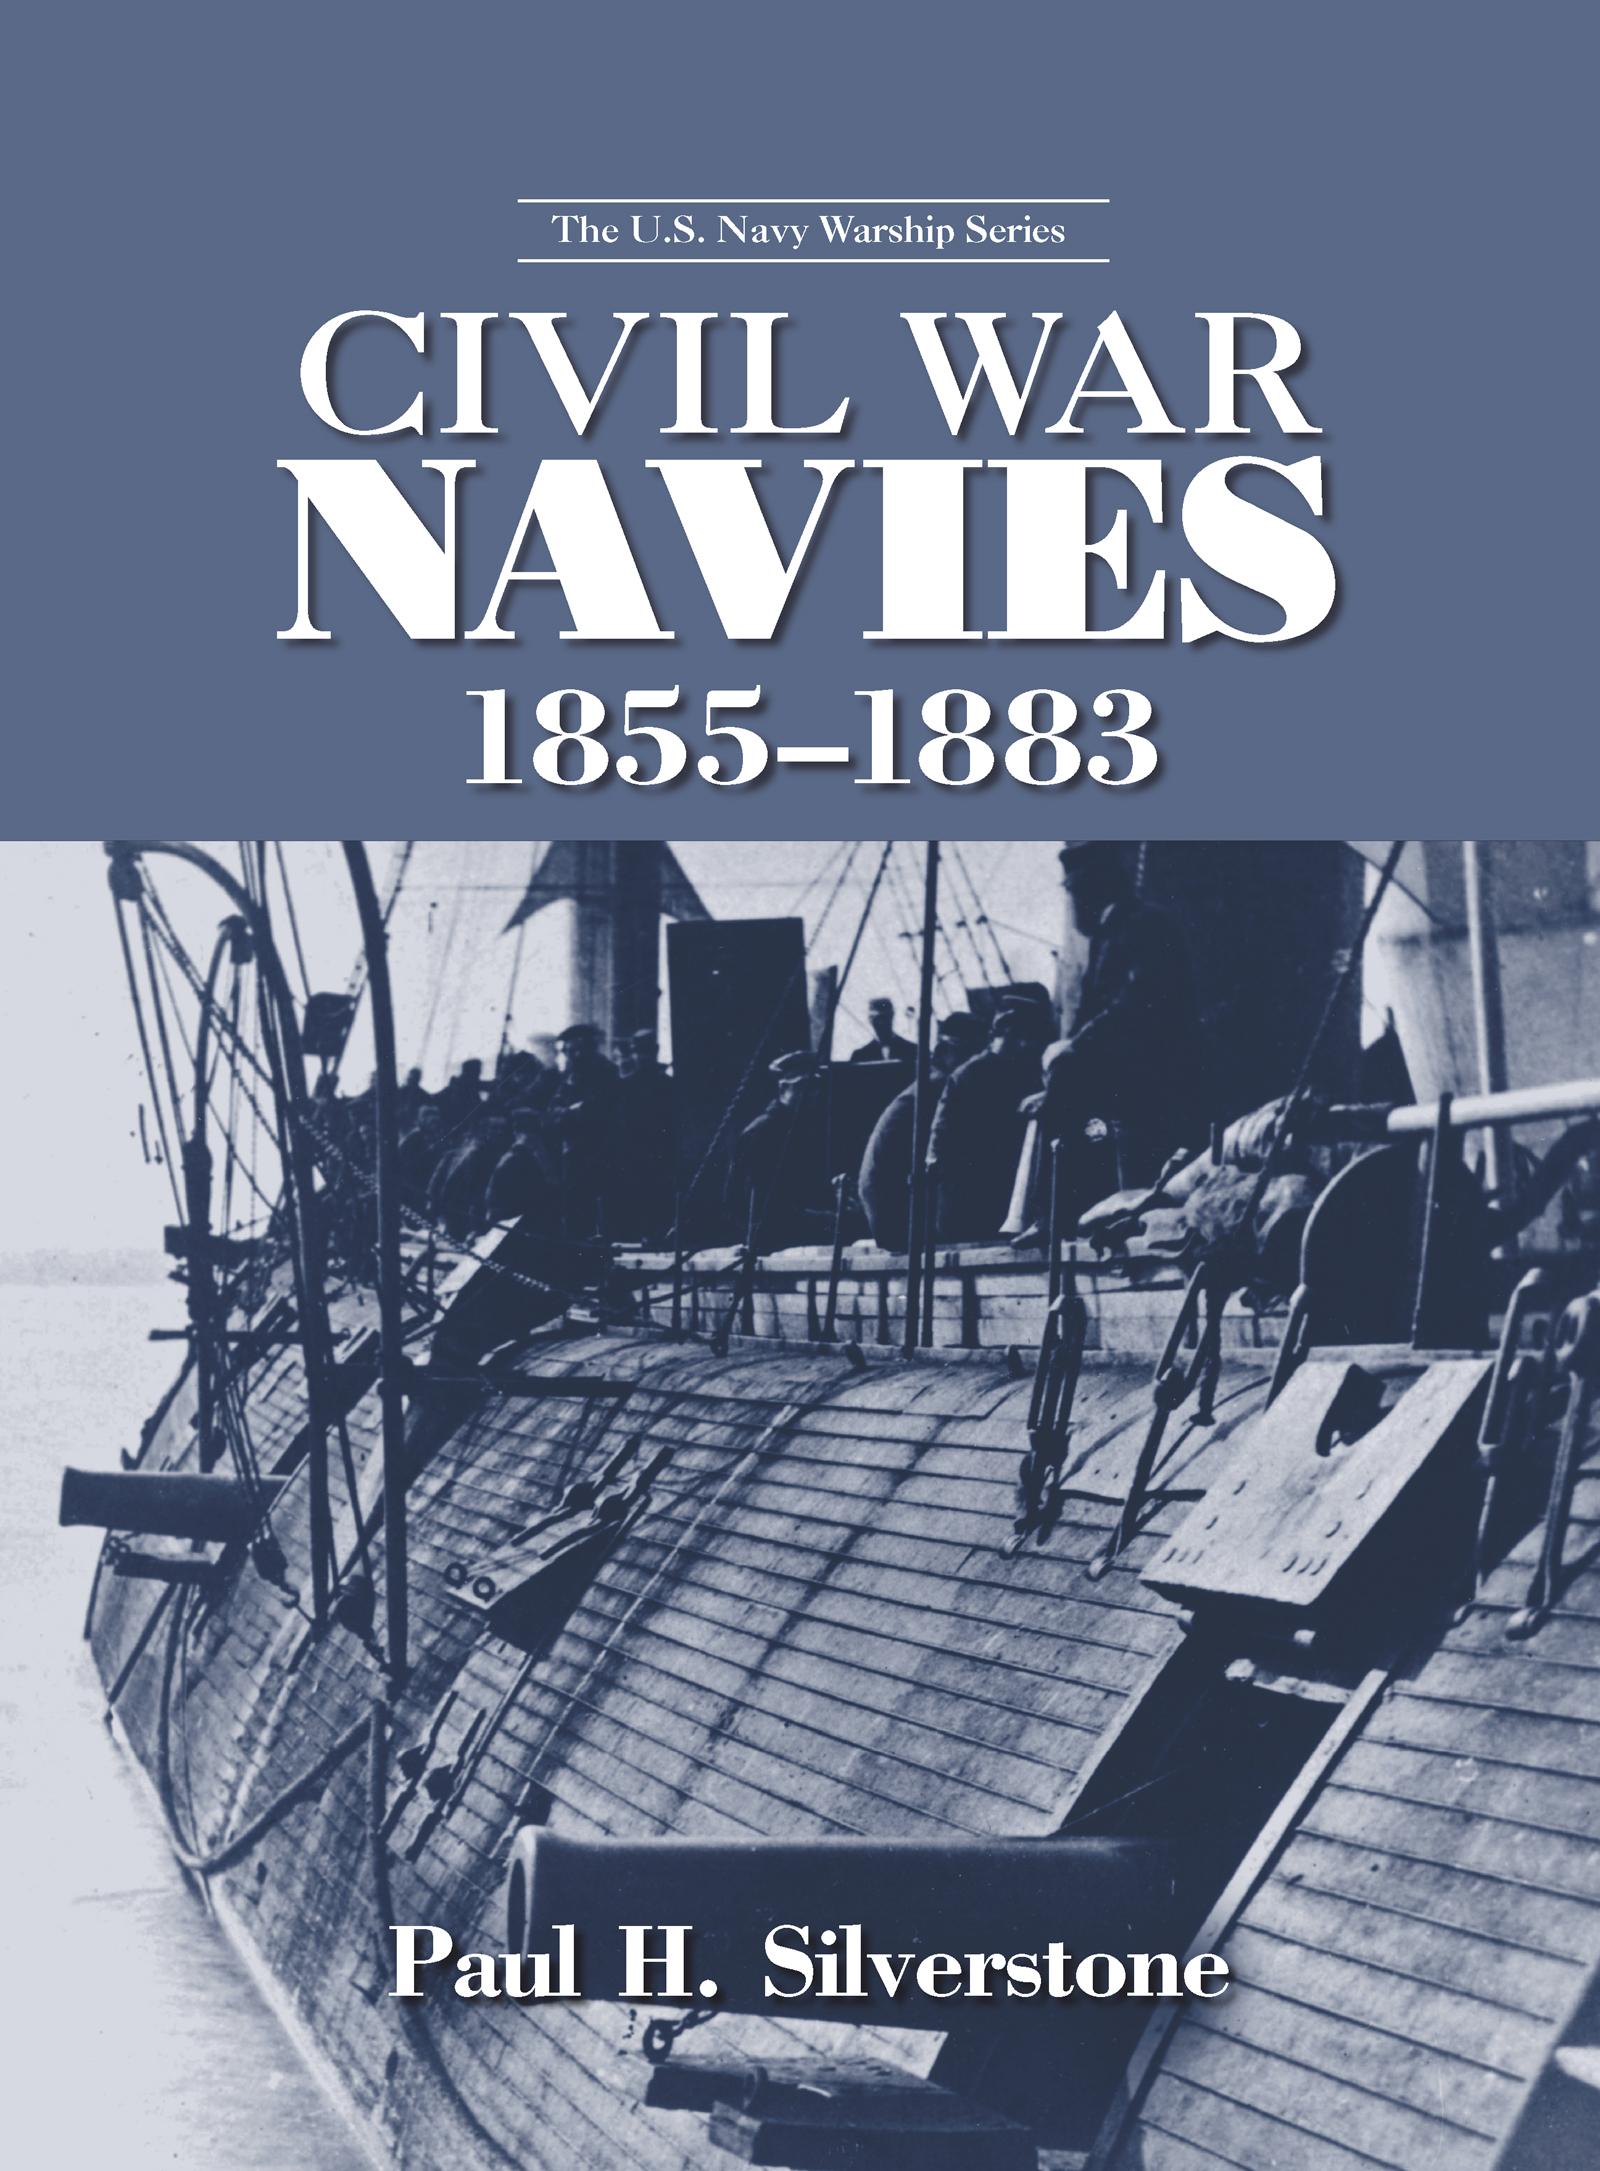 Civil War Navies, 1855-1883 book cover